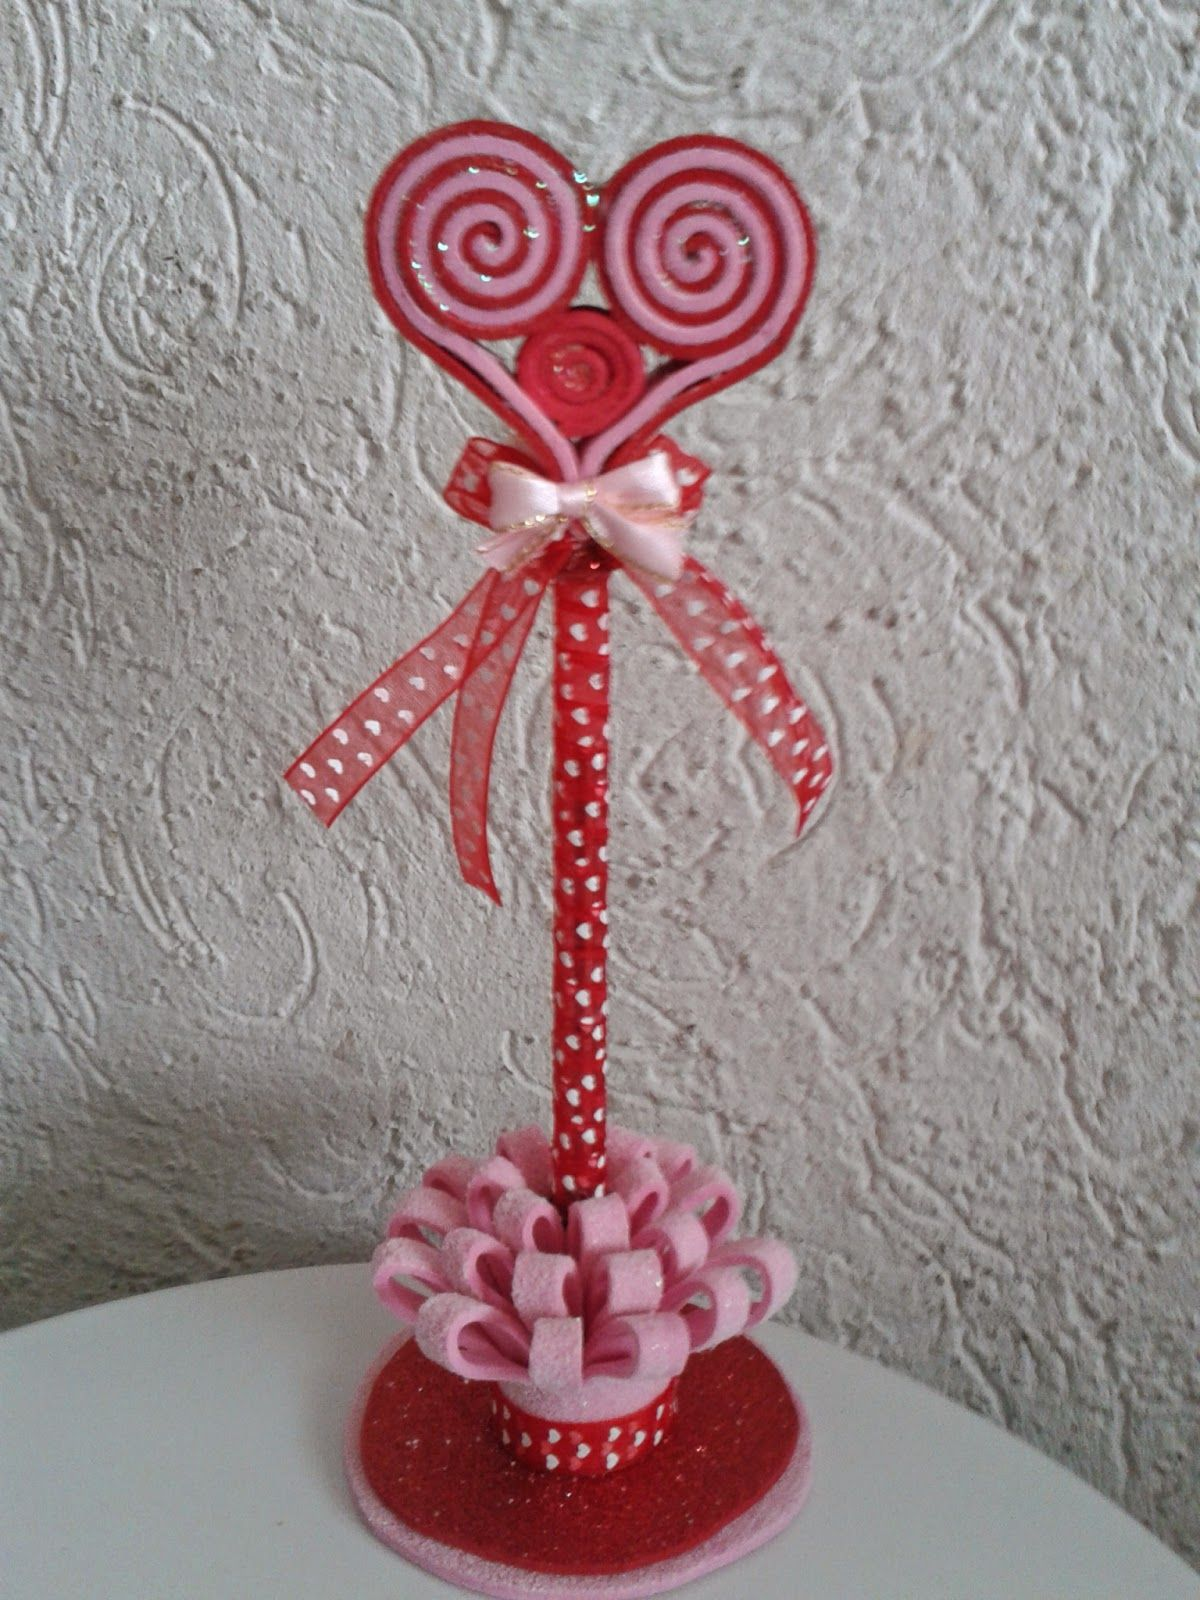 Abifomy manualidades y detalles plumas para san valentin - Detalles para decorar ...